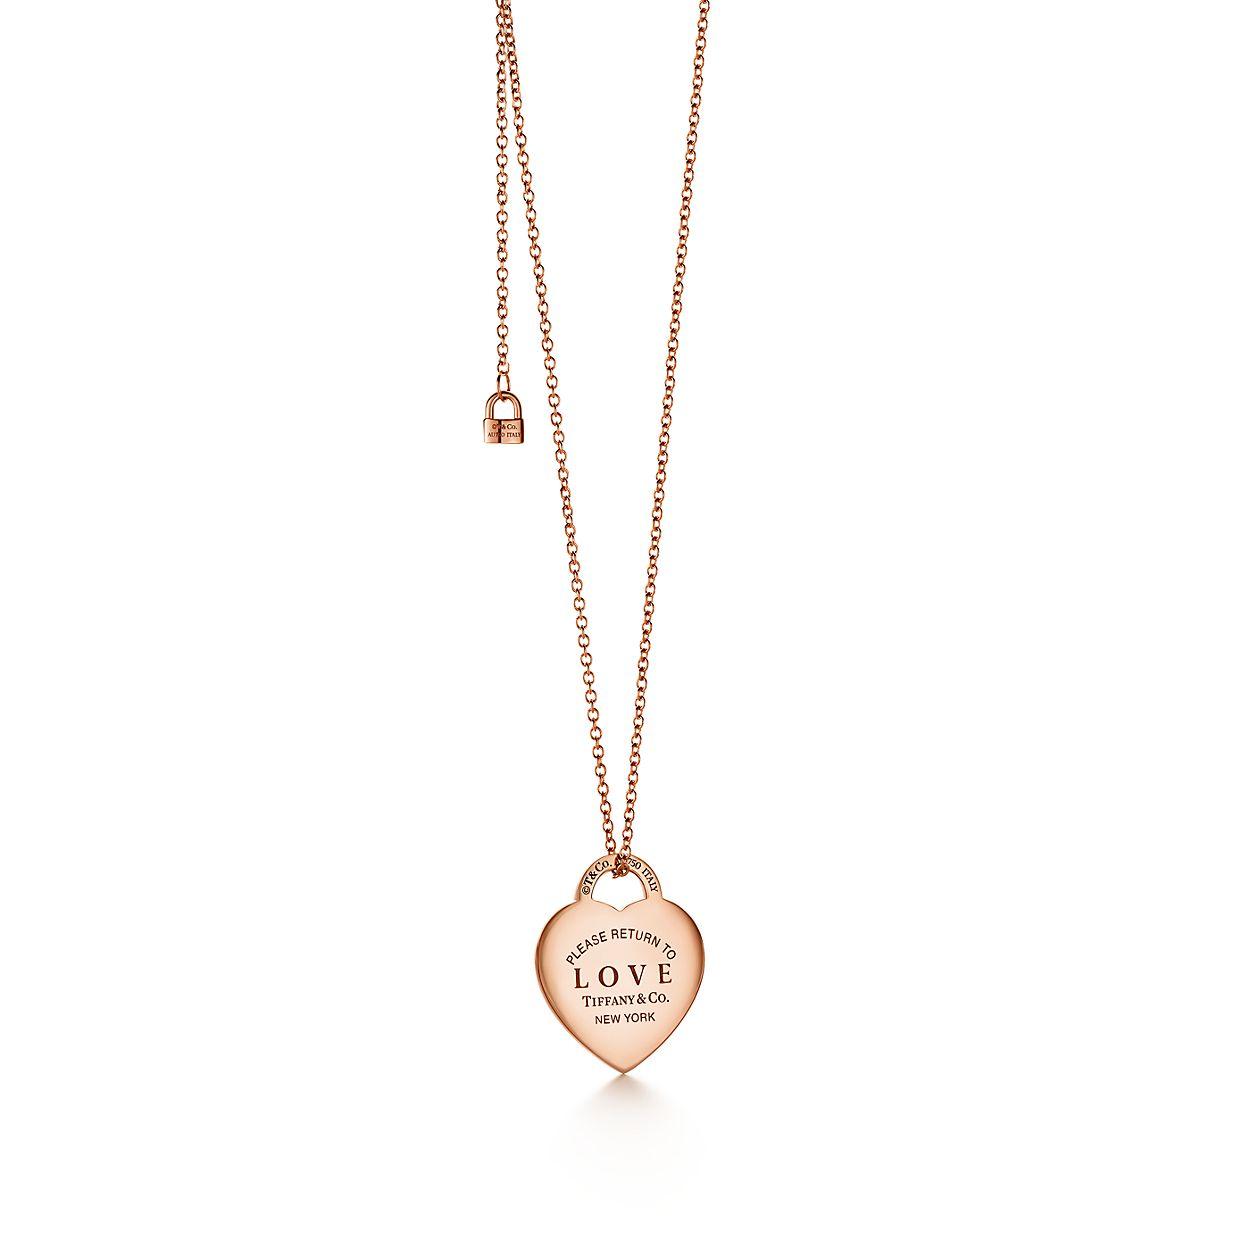 Return to Tiffany Love pendant in 18k rose gold Tiffany & Co. qcGShxlW